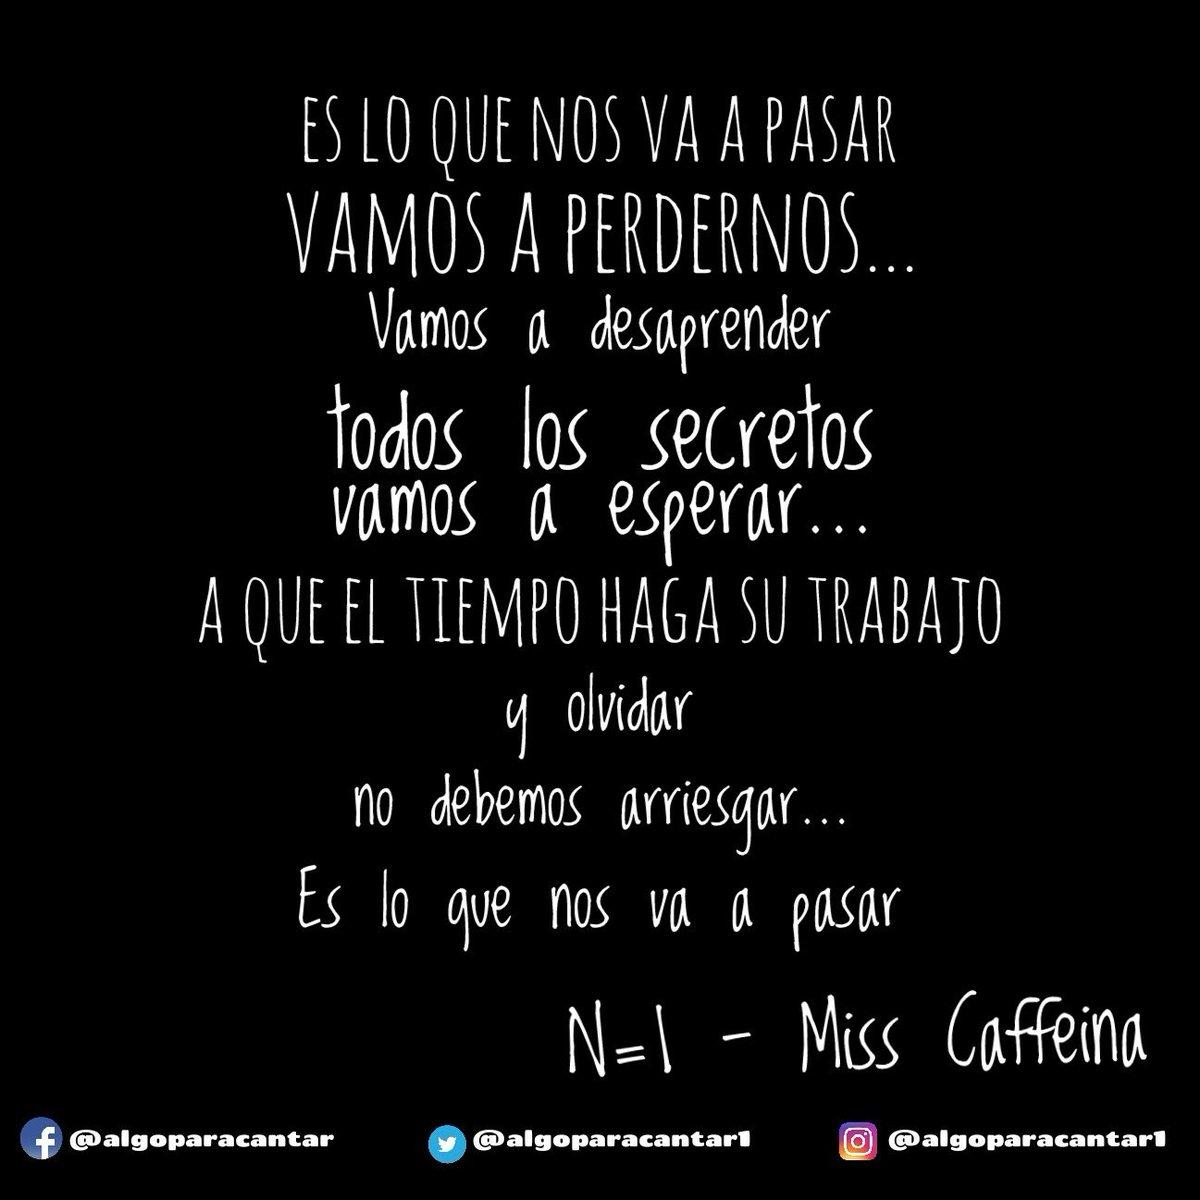 Algo Para Cantar Na Twitteru Frases Misscaffeina N1